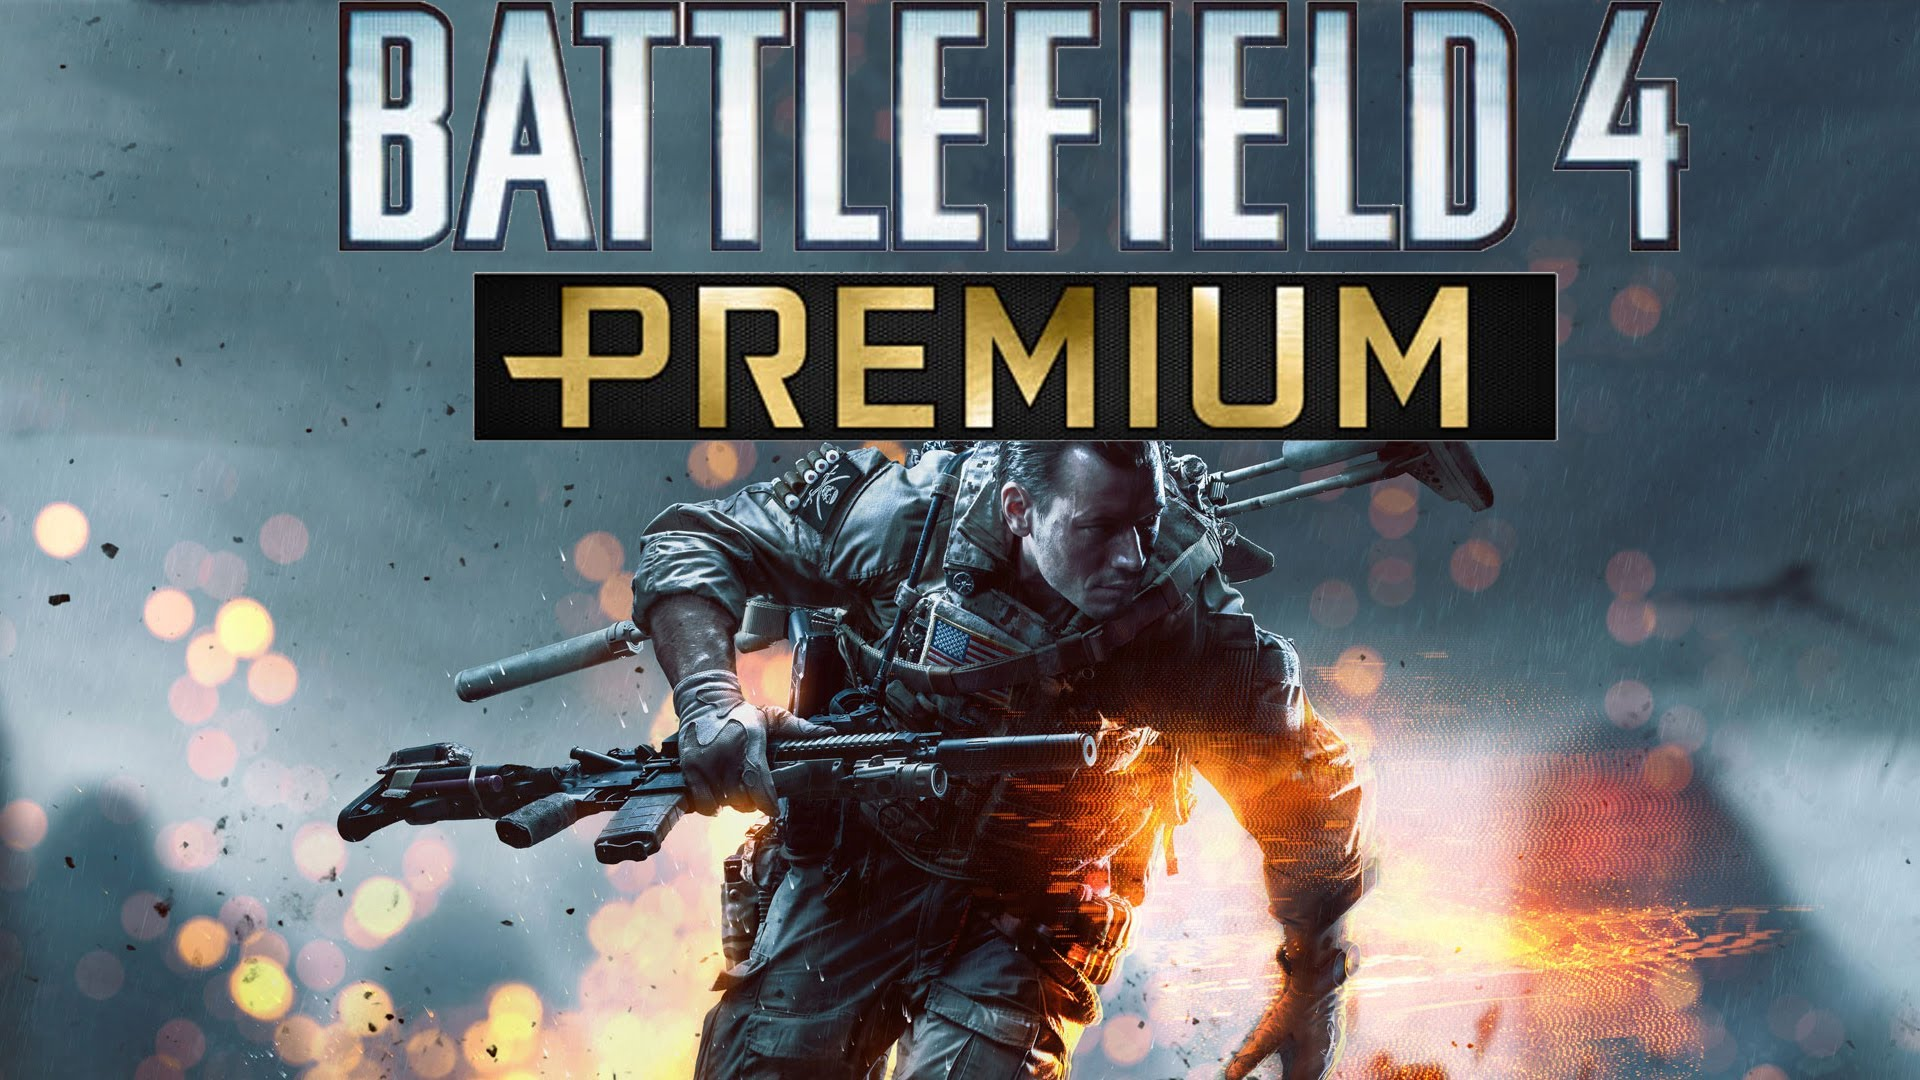 Battlefield 4 Premium + Battlefield 3 Premium [ORIGIN]